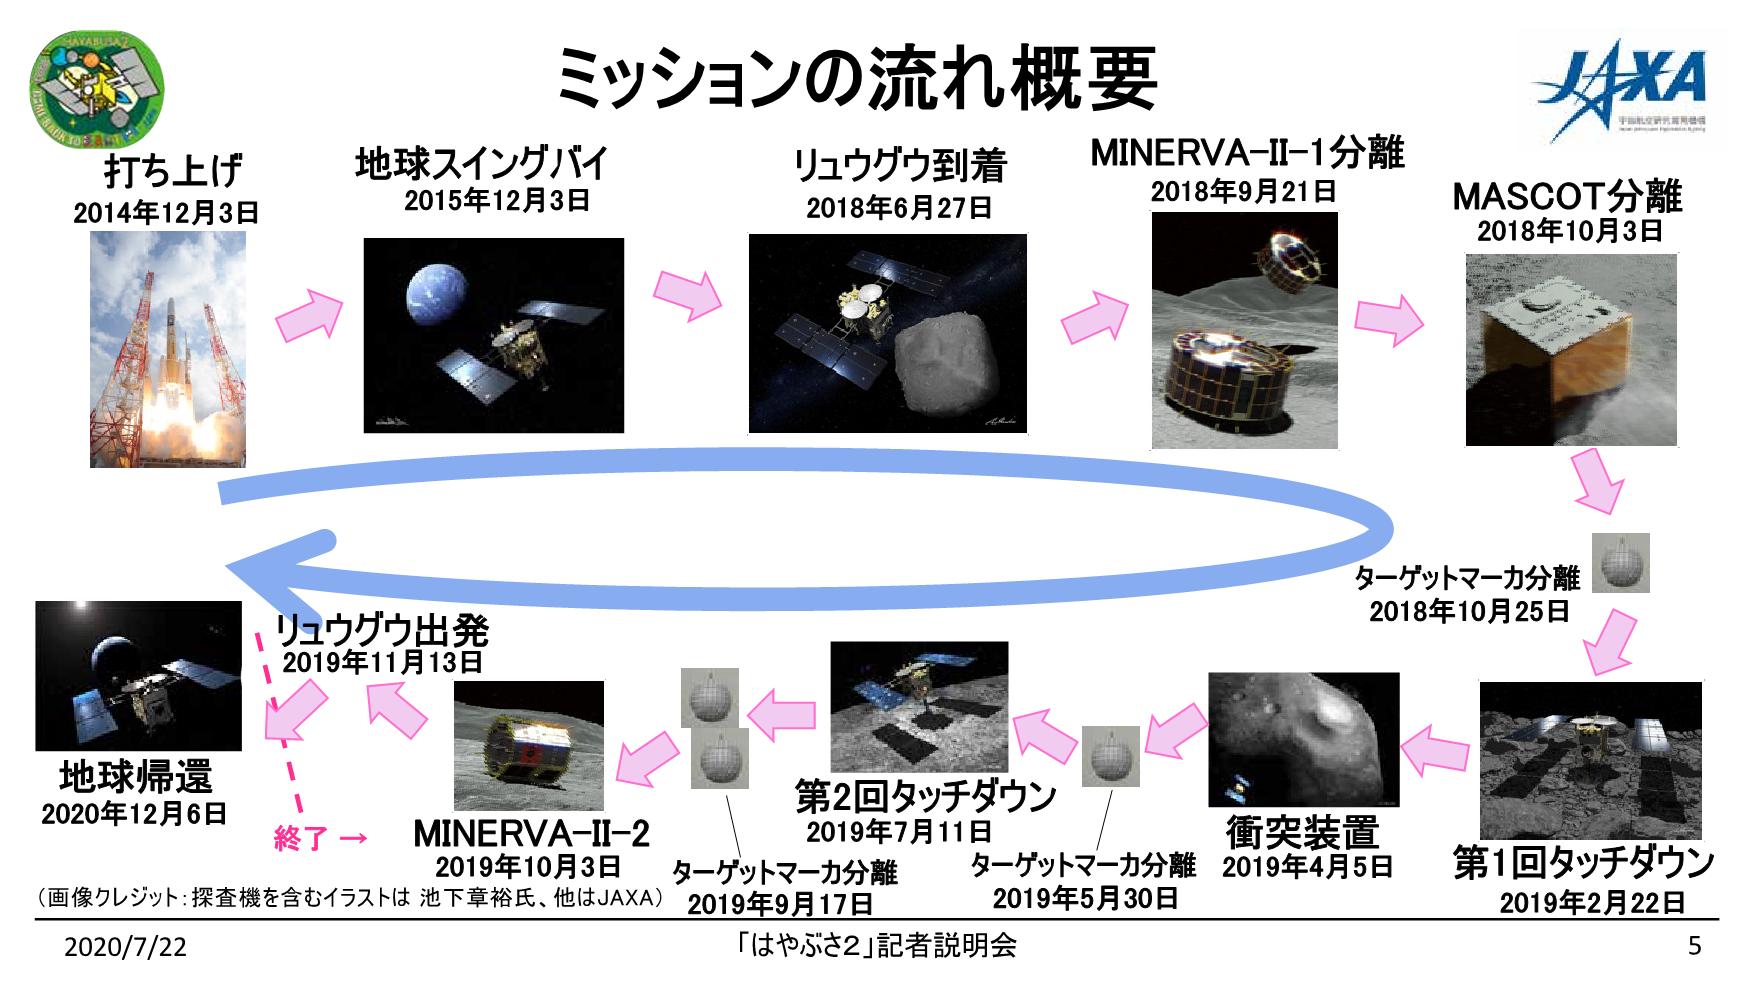 f:id:Imamura:20200722140637p:plain